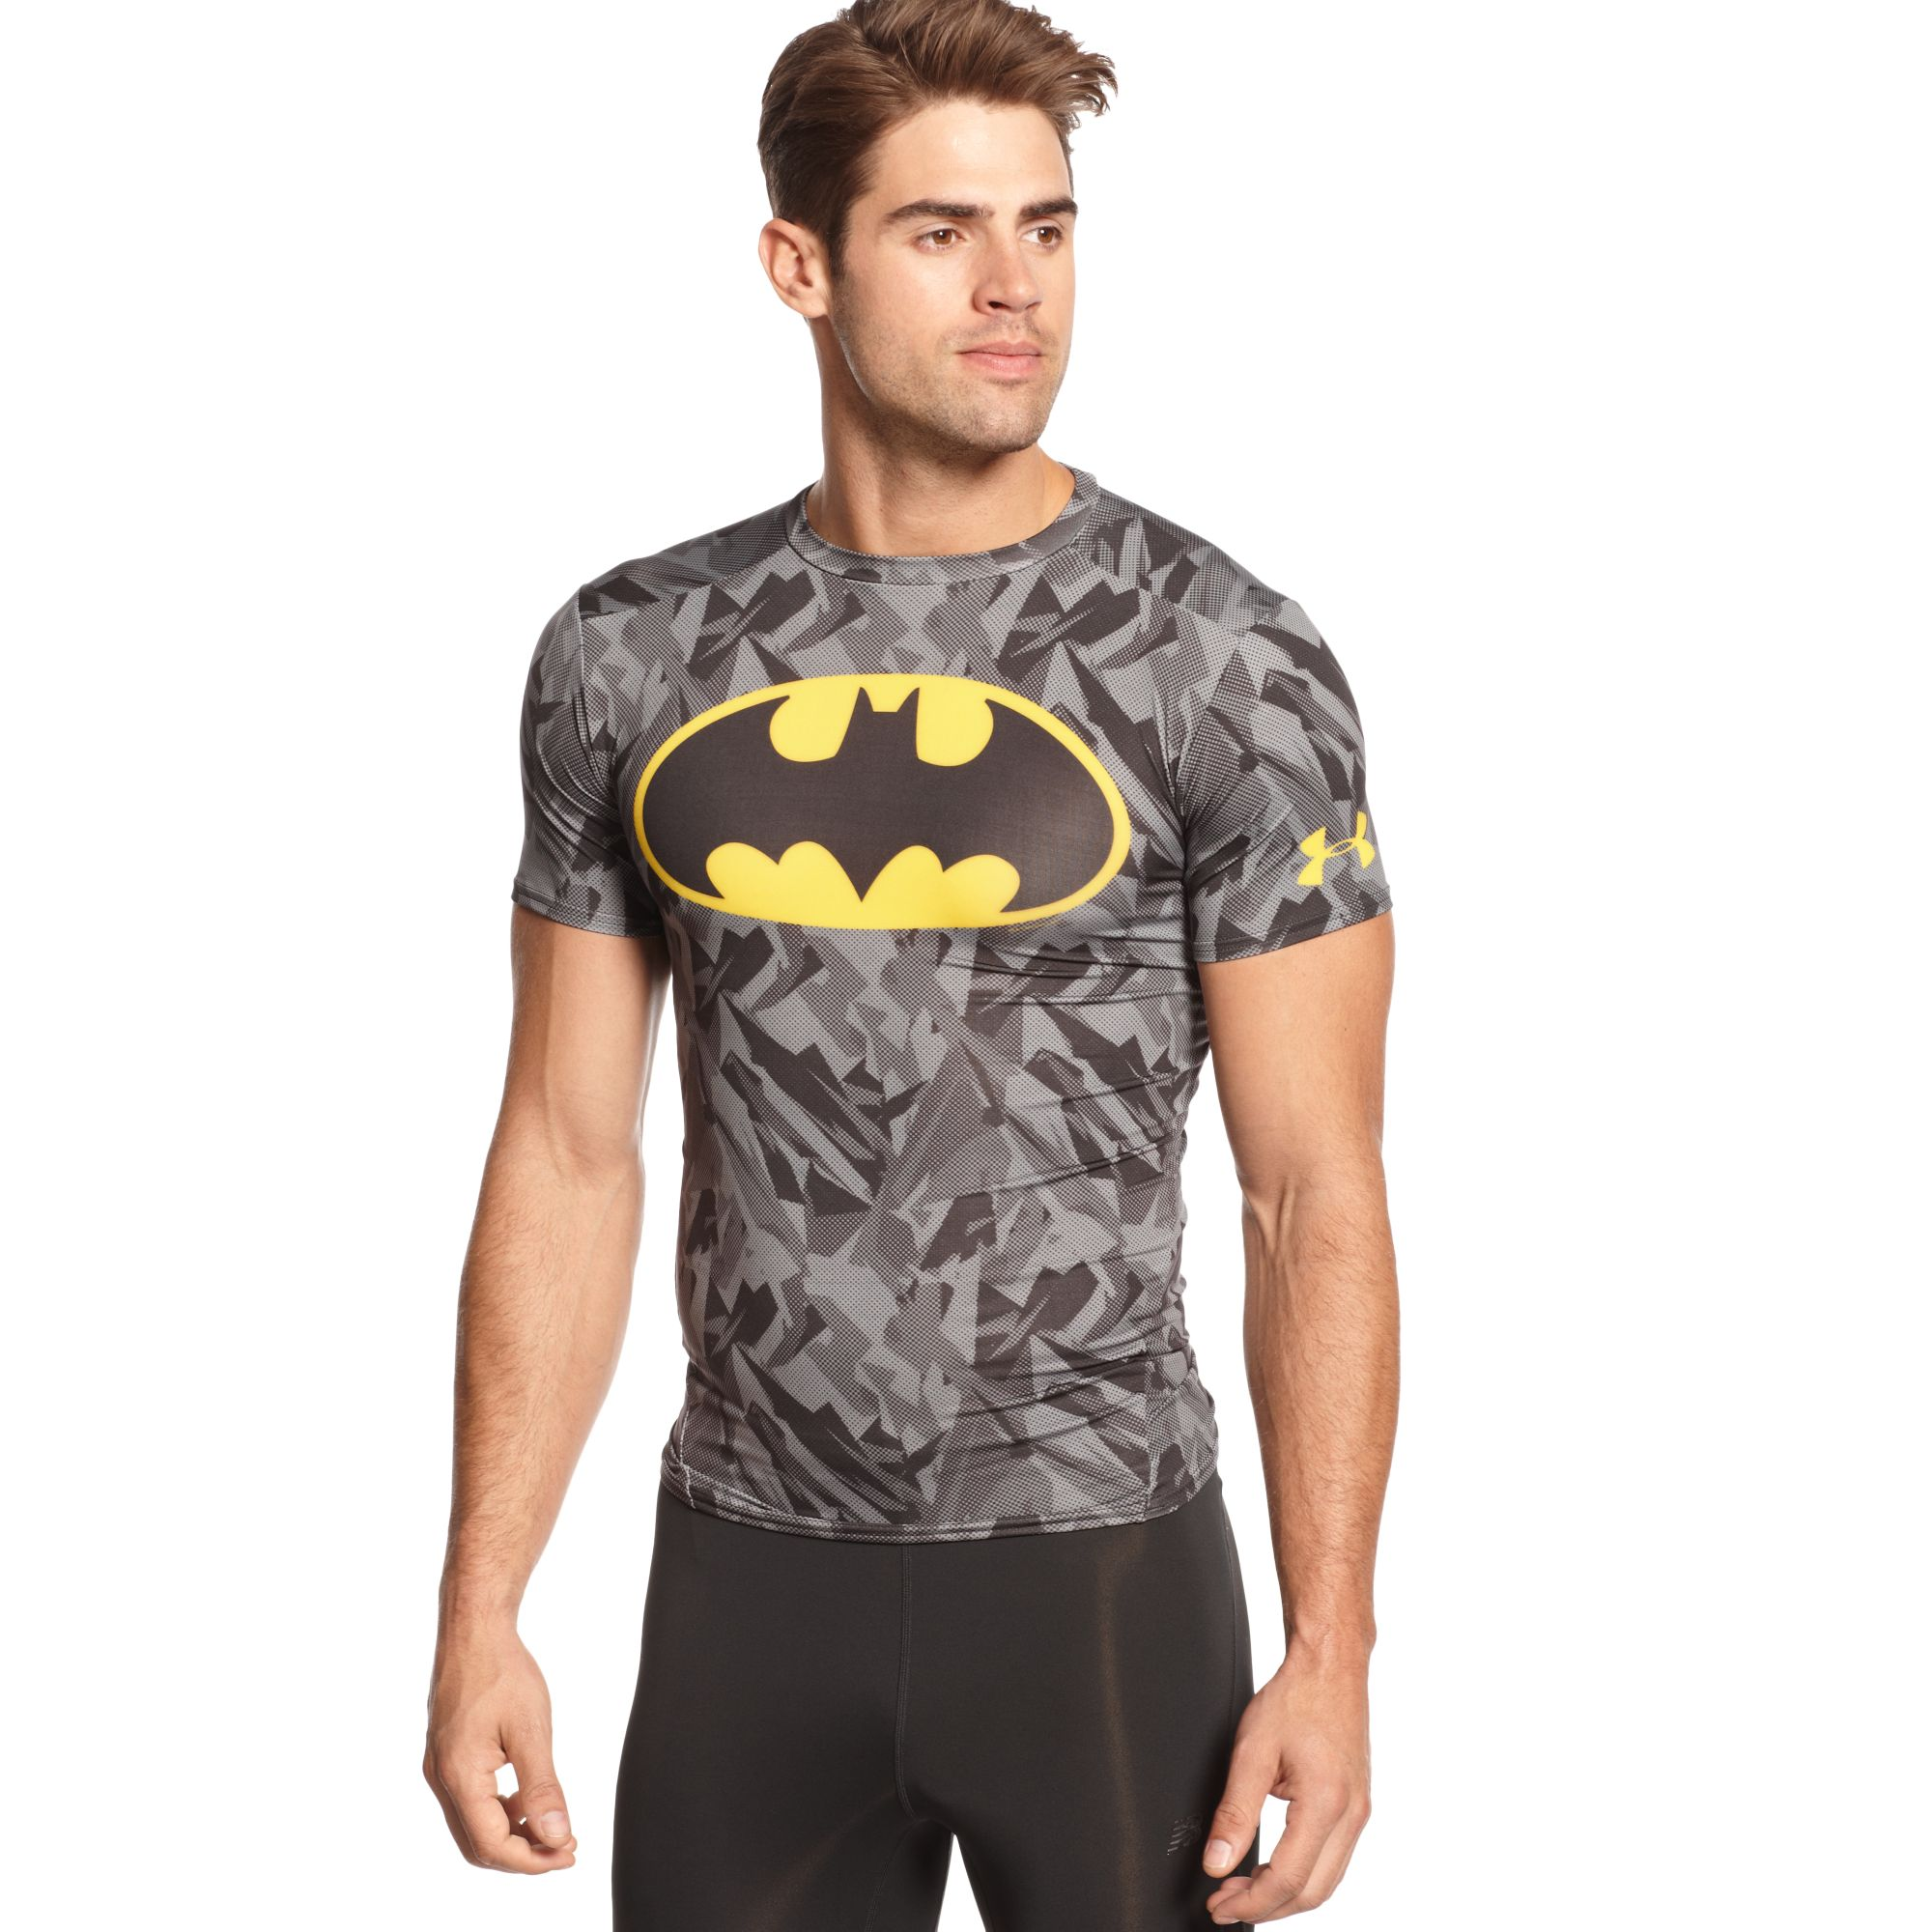 305fafac Under Armour Alter Ego Batman Compression T-Shirt in Black for Men ...